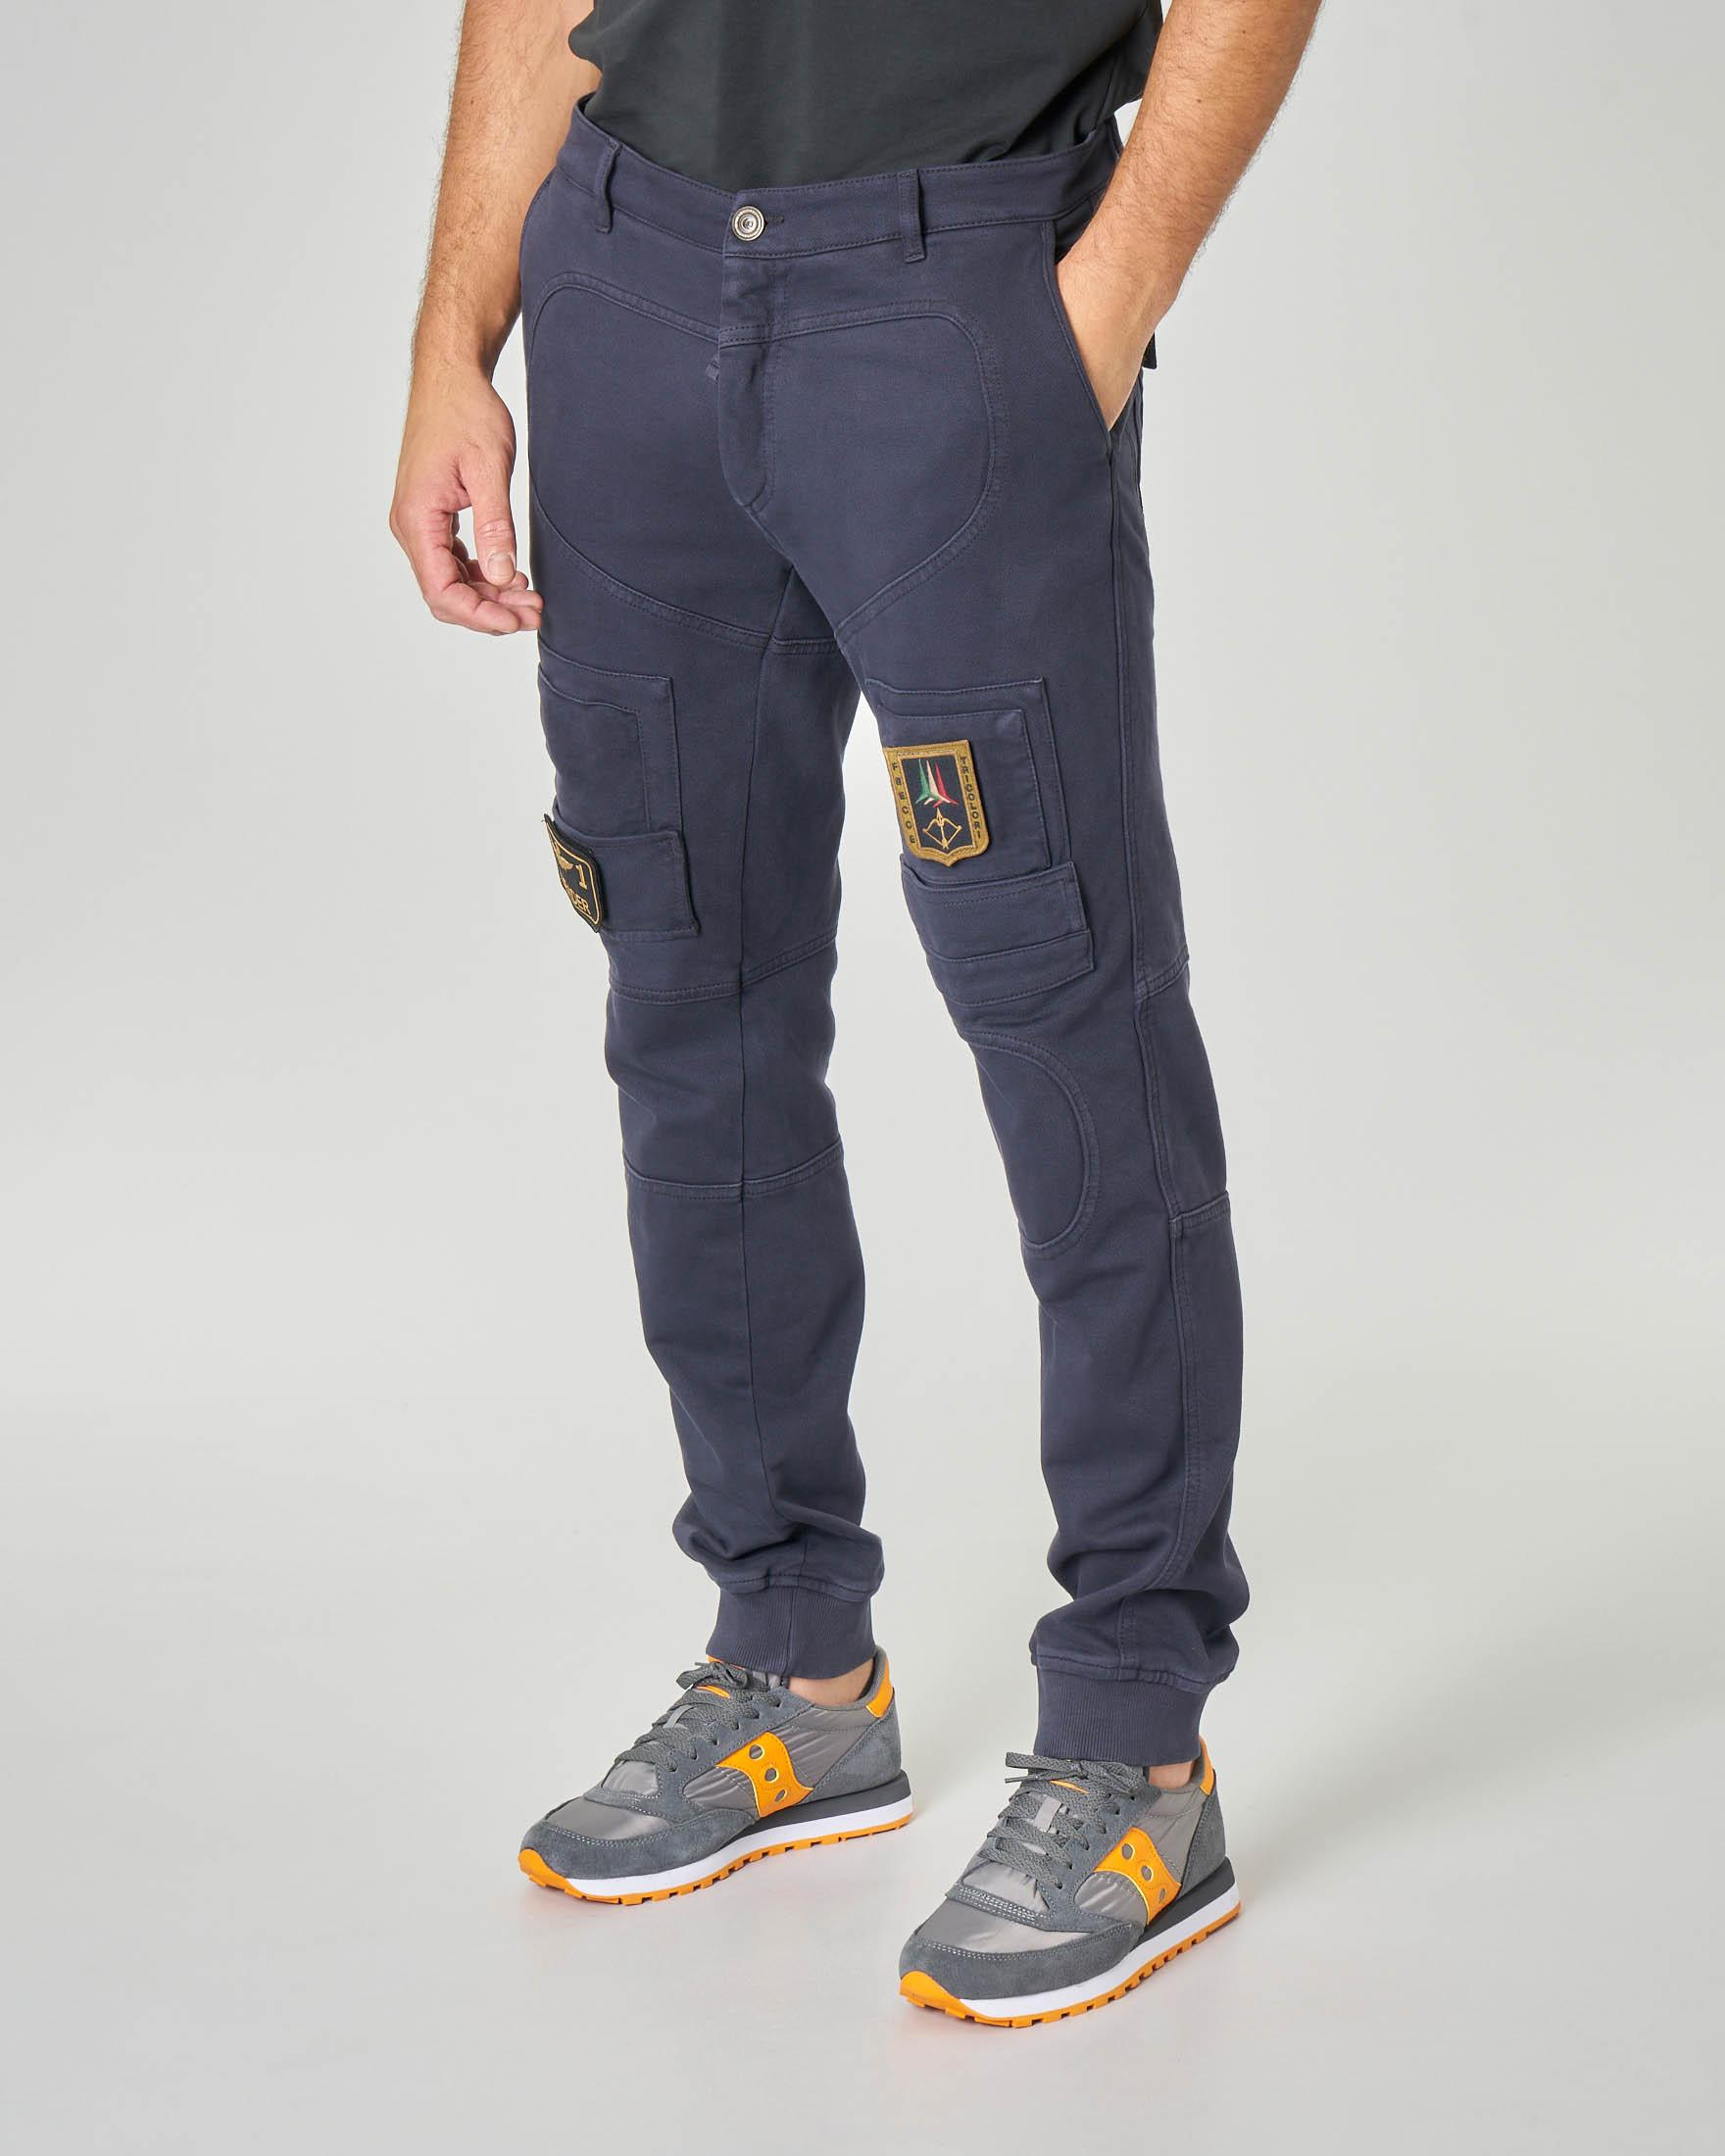 Pantalone Anti-G blu in felpa